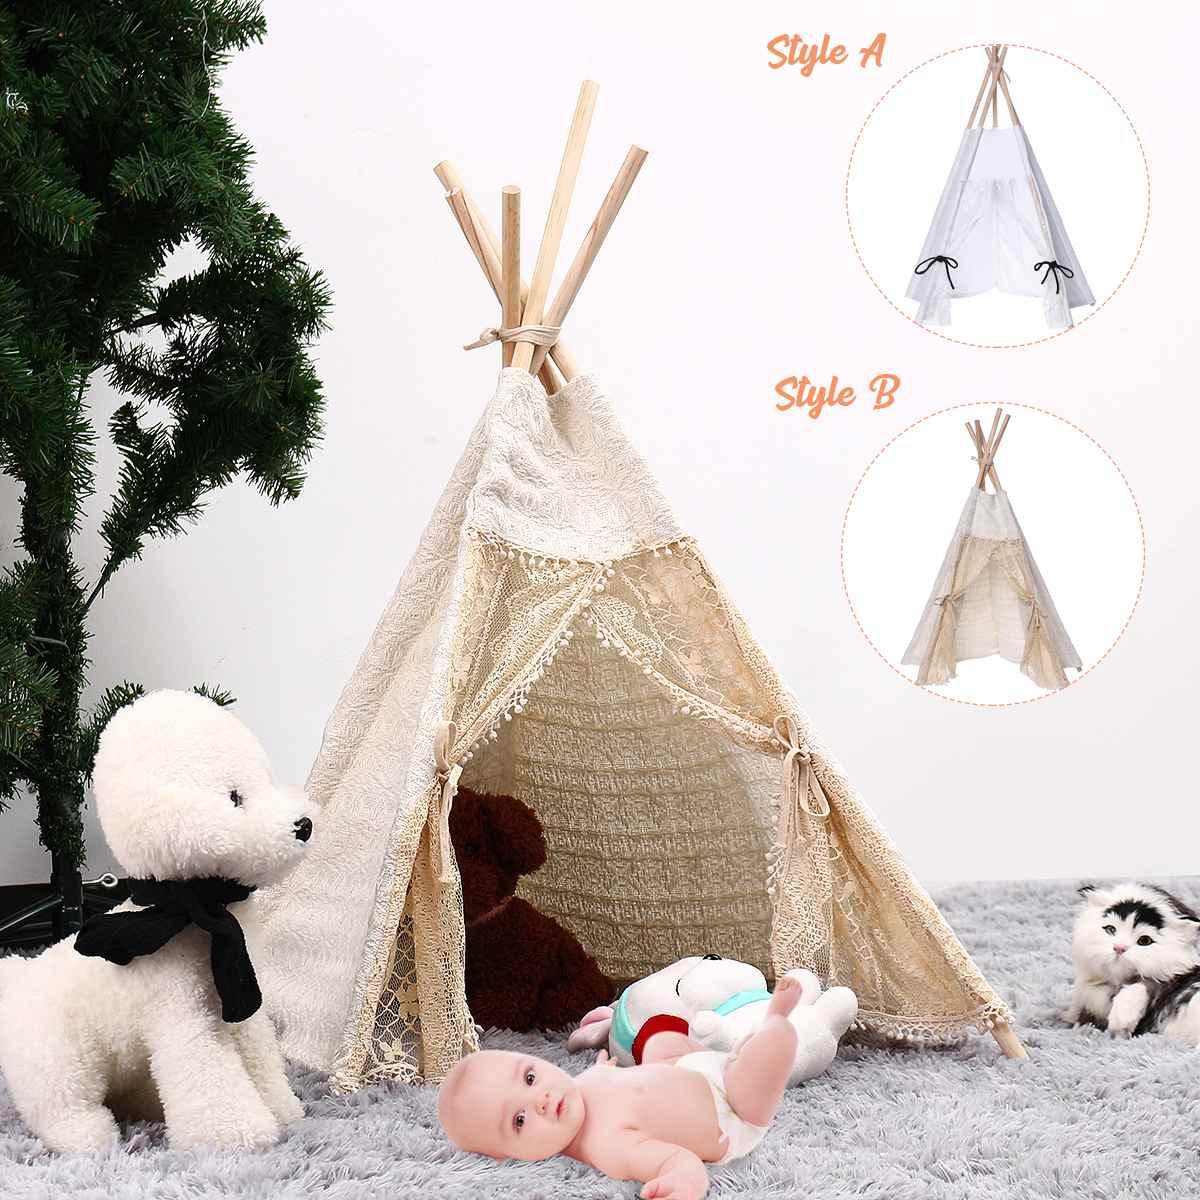 80cm-Large Canvas Teepee Tent Kids Teepee Tipi House Children Tipi Tee Tent Kids Sleeping Newborn Photography Photo Props